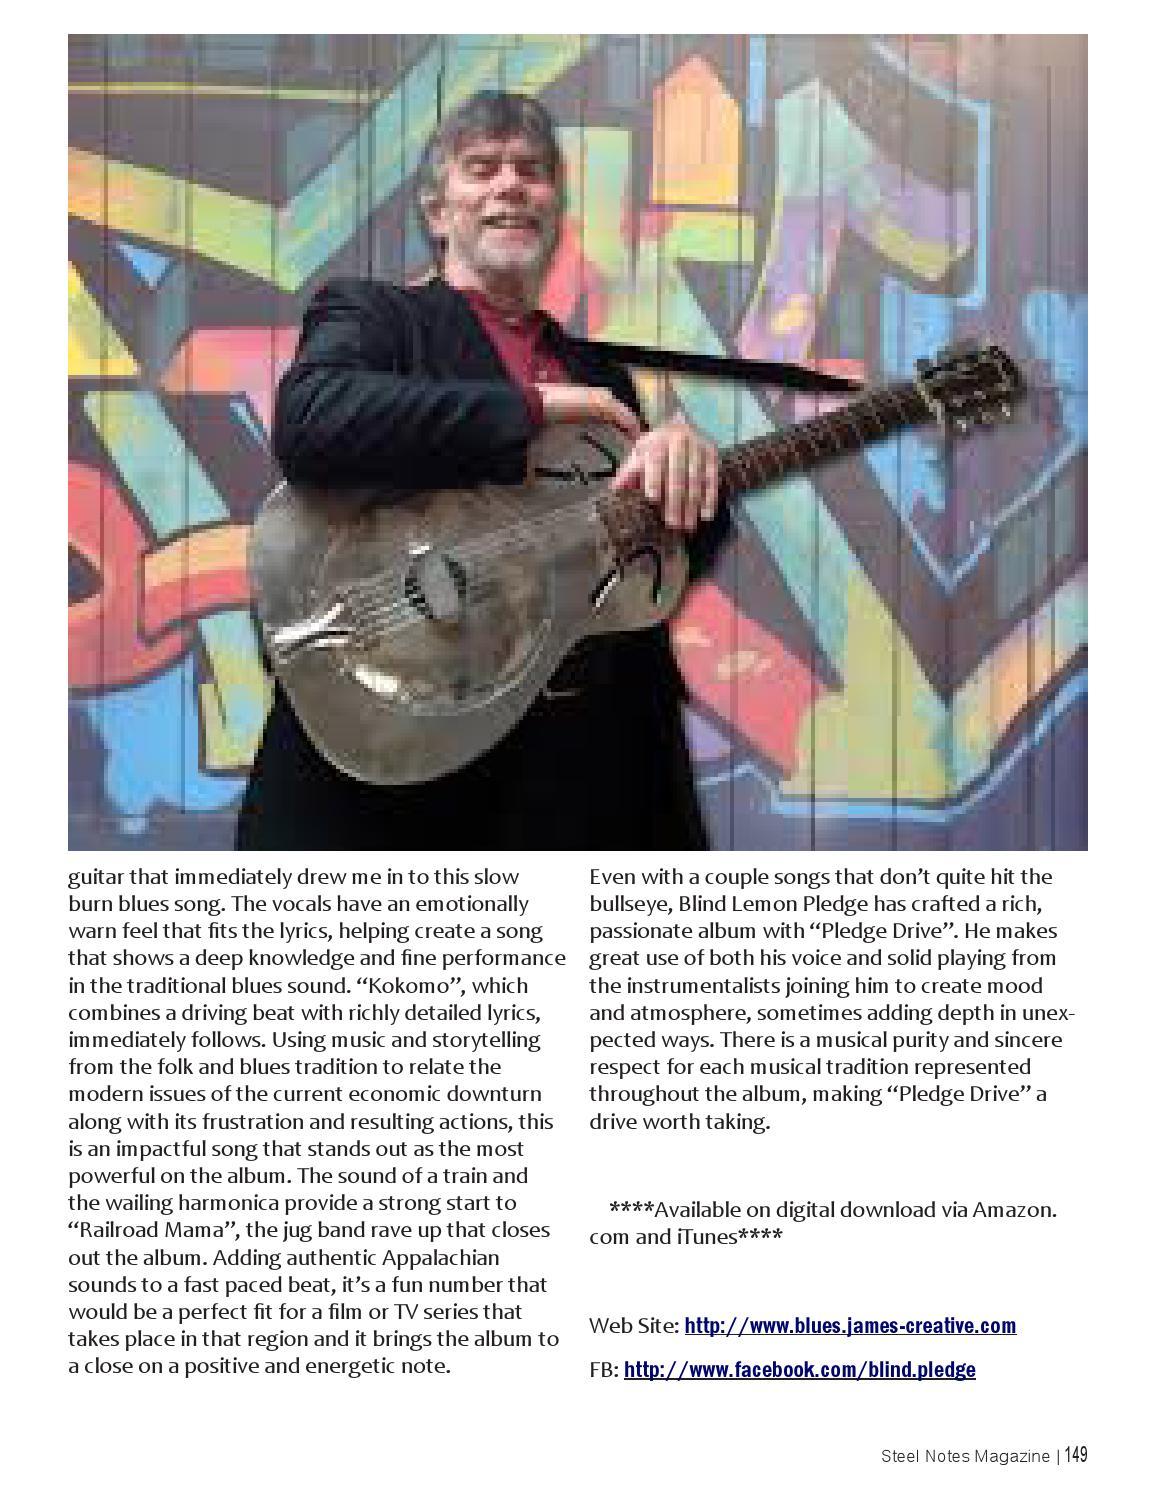 Steel Notes Magazine April 2016